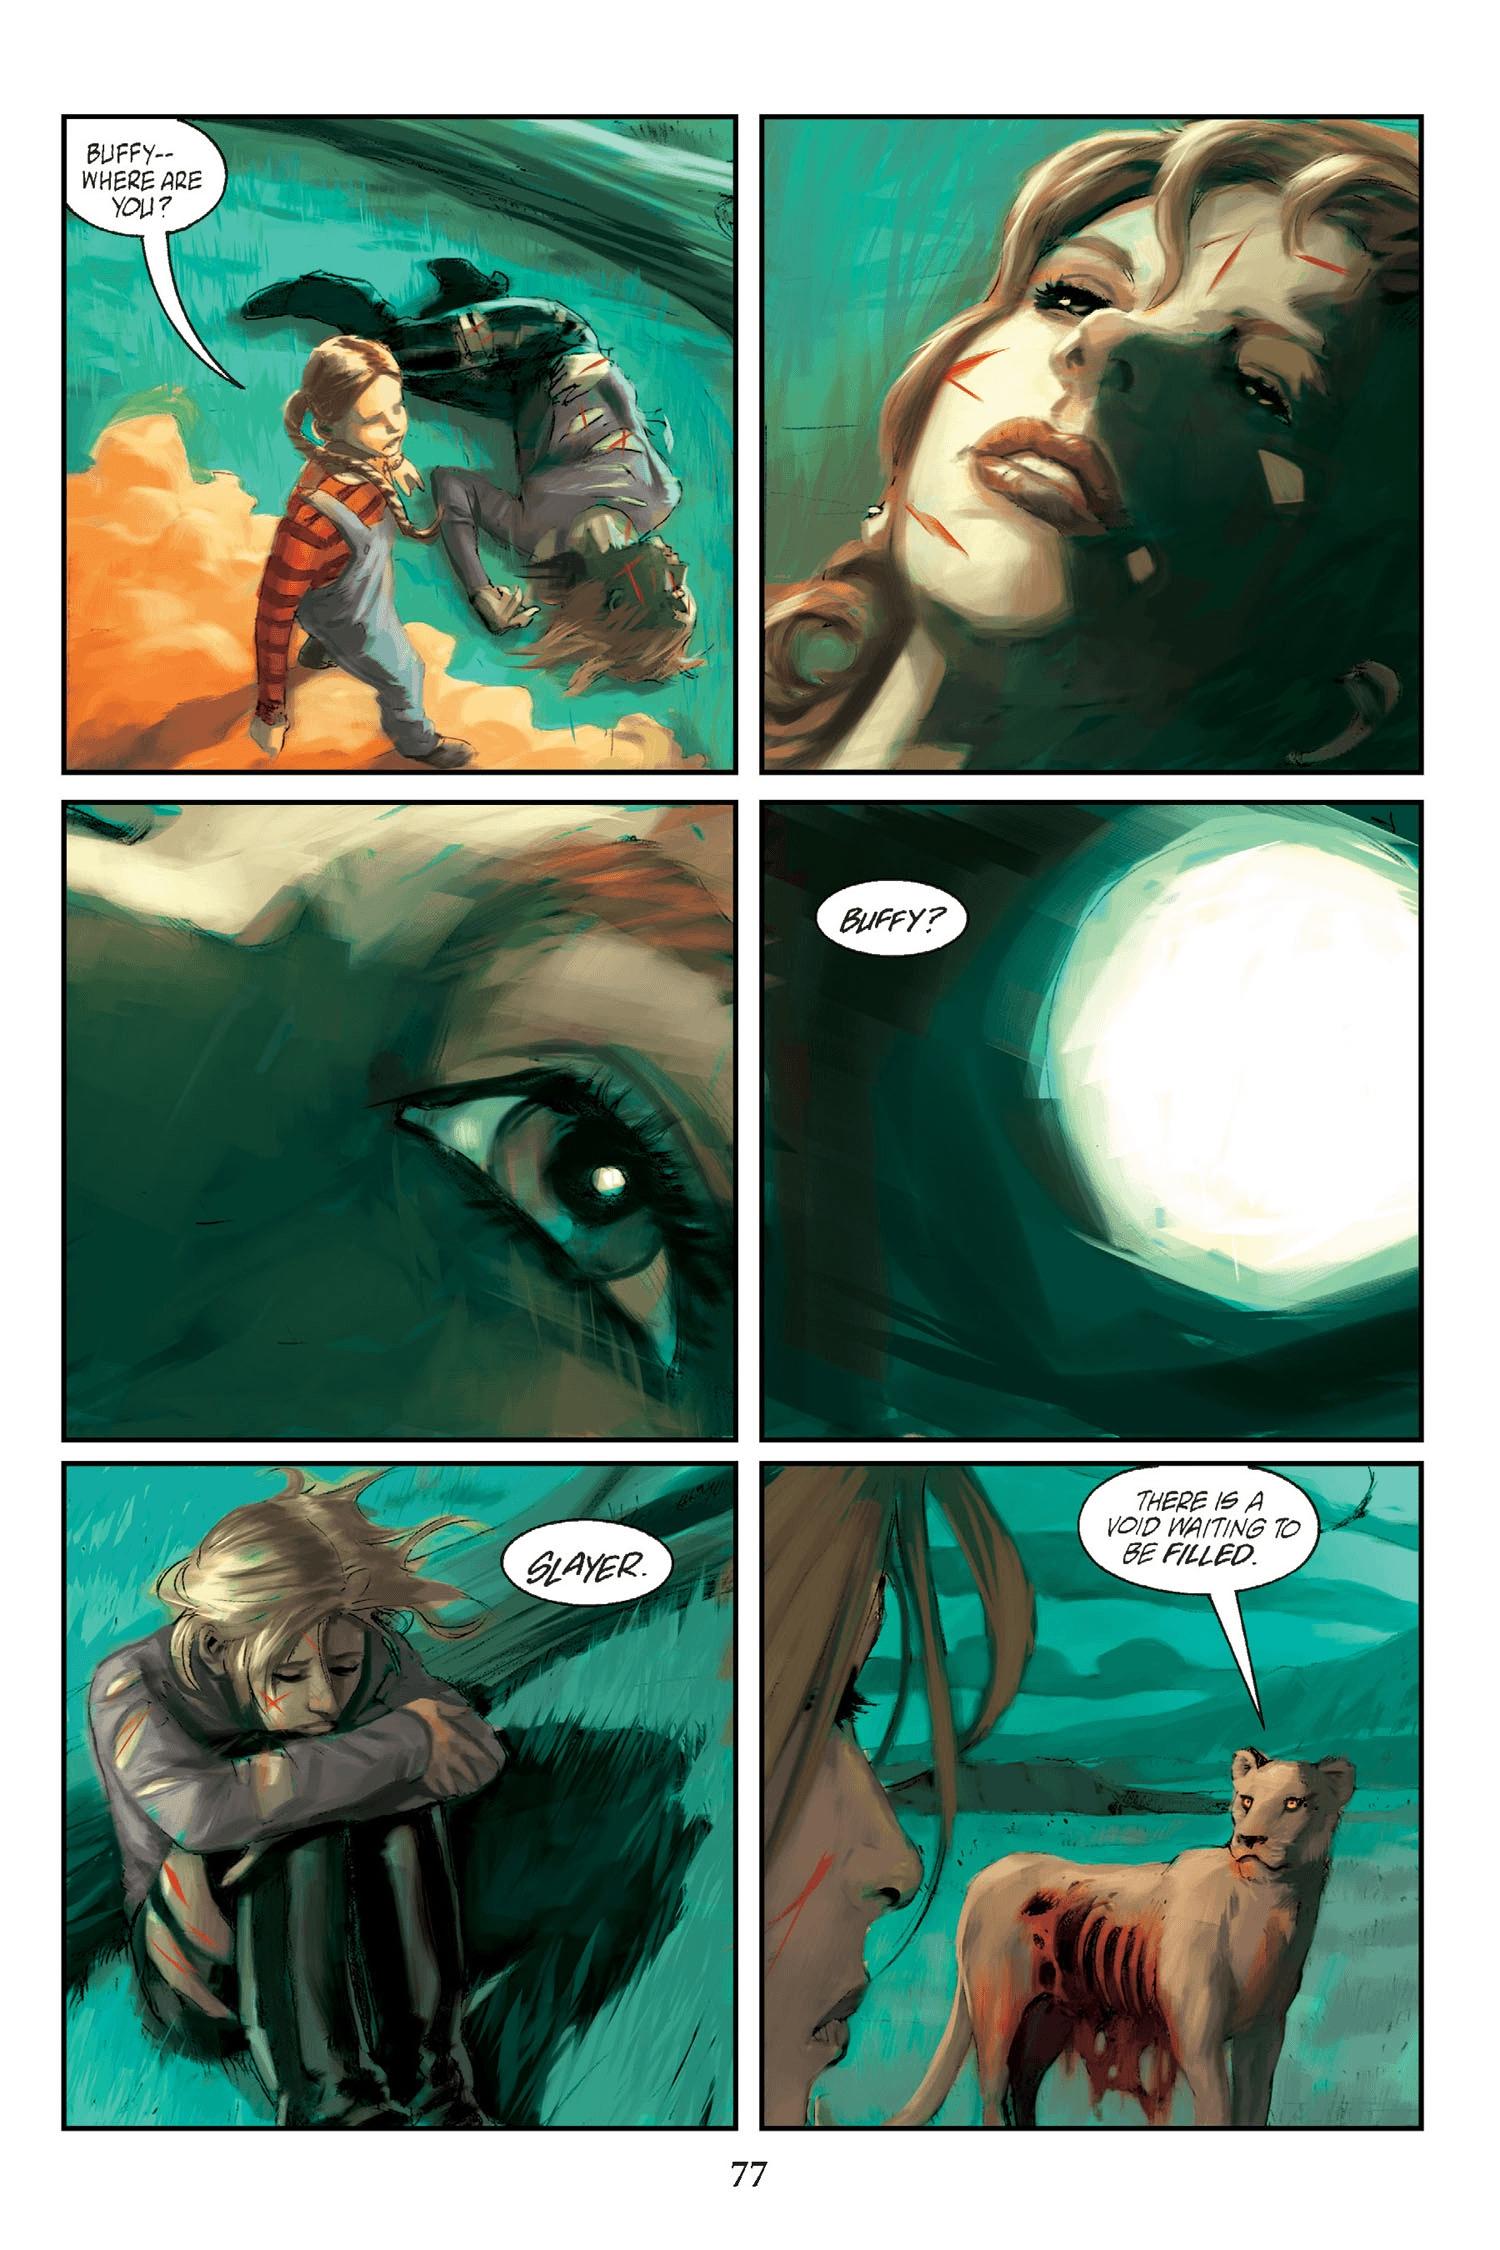 Read online Buffy the Vampire Slayer: Omnibus comic -  Issue # TPB 2 - 75